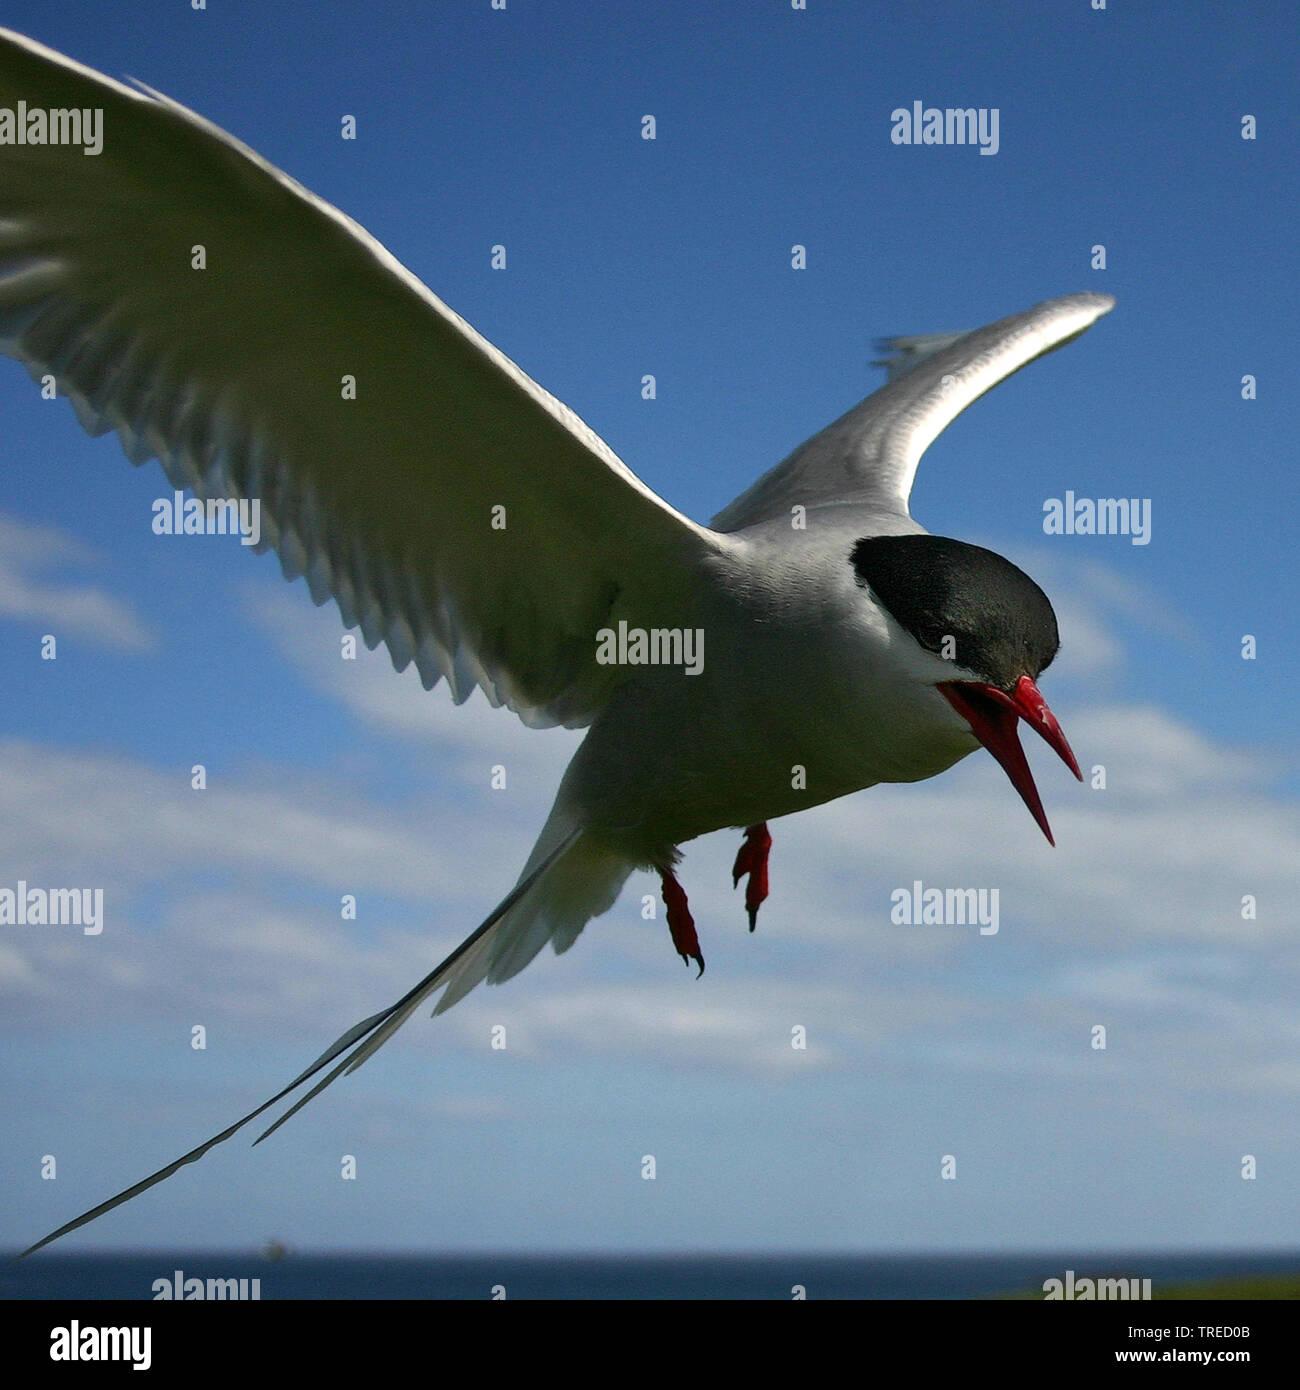 Kuestenseeschwalbe, Kuesten-Seeschwalbe (Sterna paradisaea), im Flug am Himmel, Grossbritannien, England, Northumberland, Farne Islands | arctic tern - Stock Image